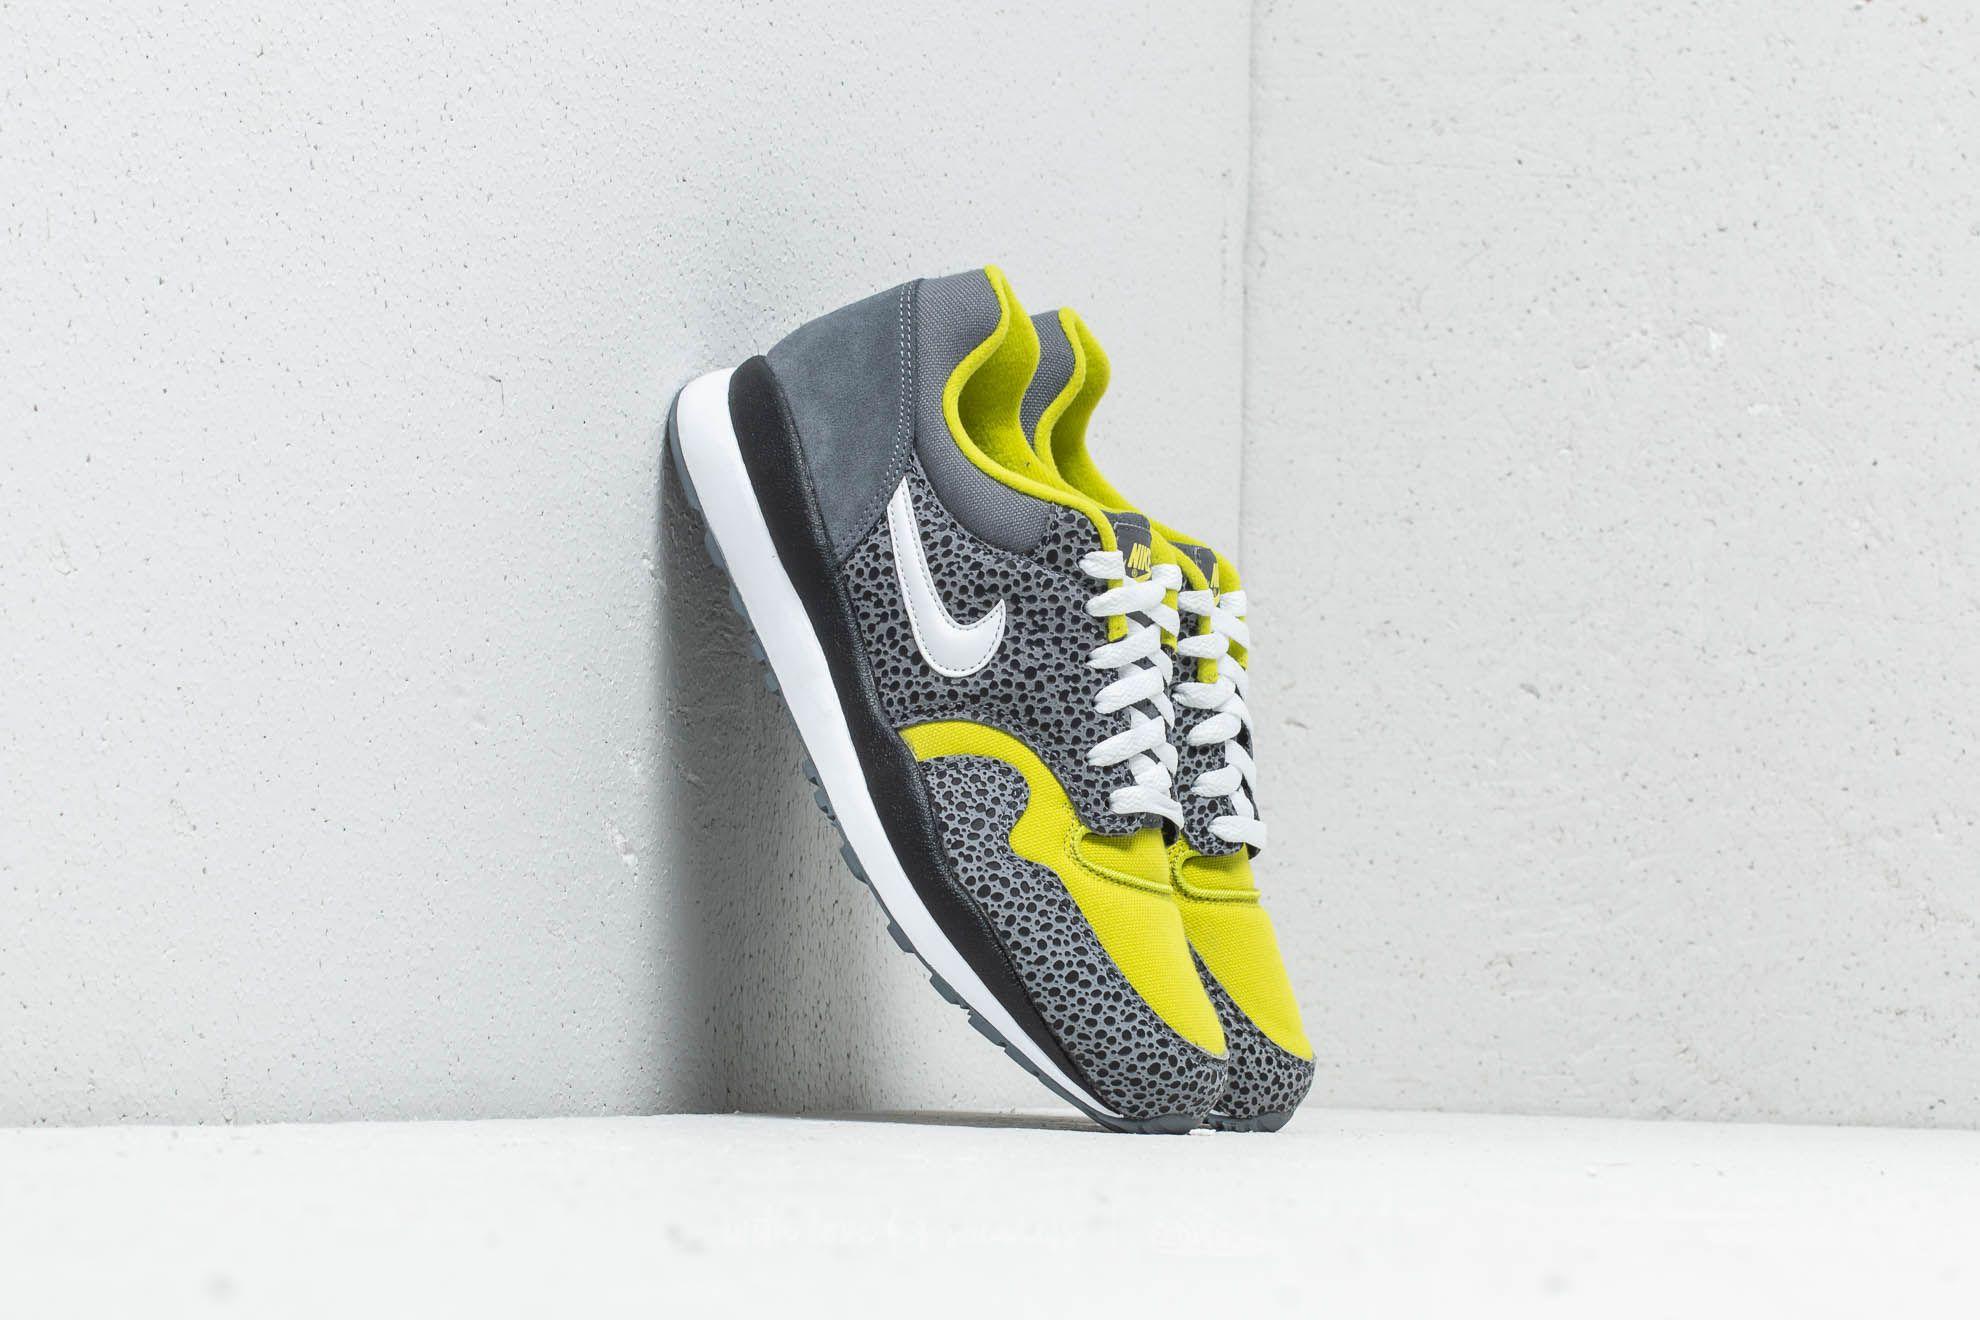 Nike Air Safari SE Flint Grey/ White-Bright Cactus za skvělou cenu 2 090 Kč koupíte na Footshop.cz